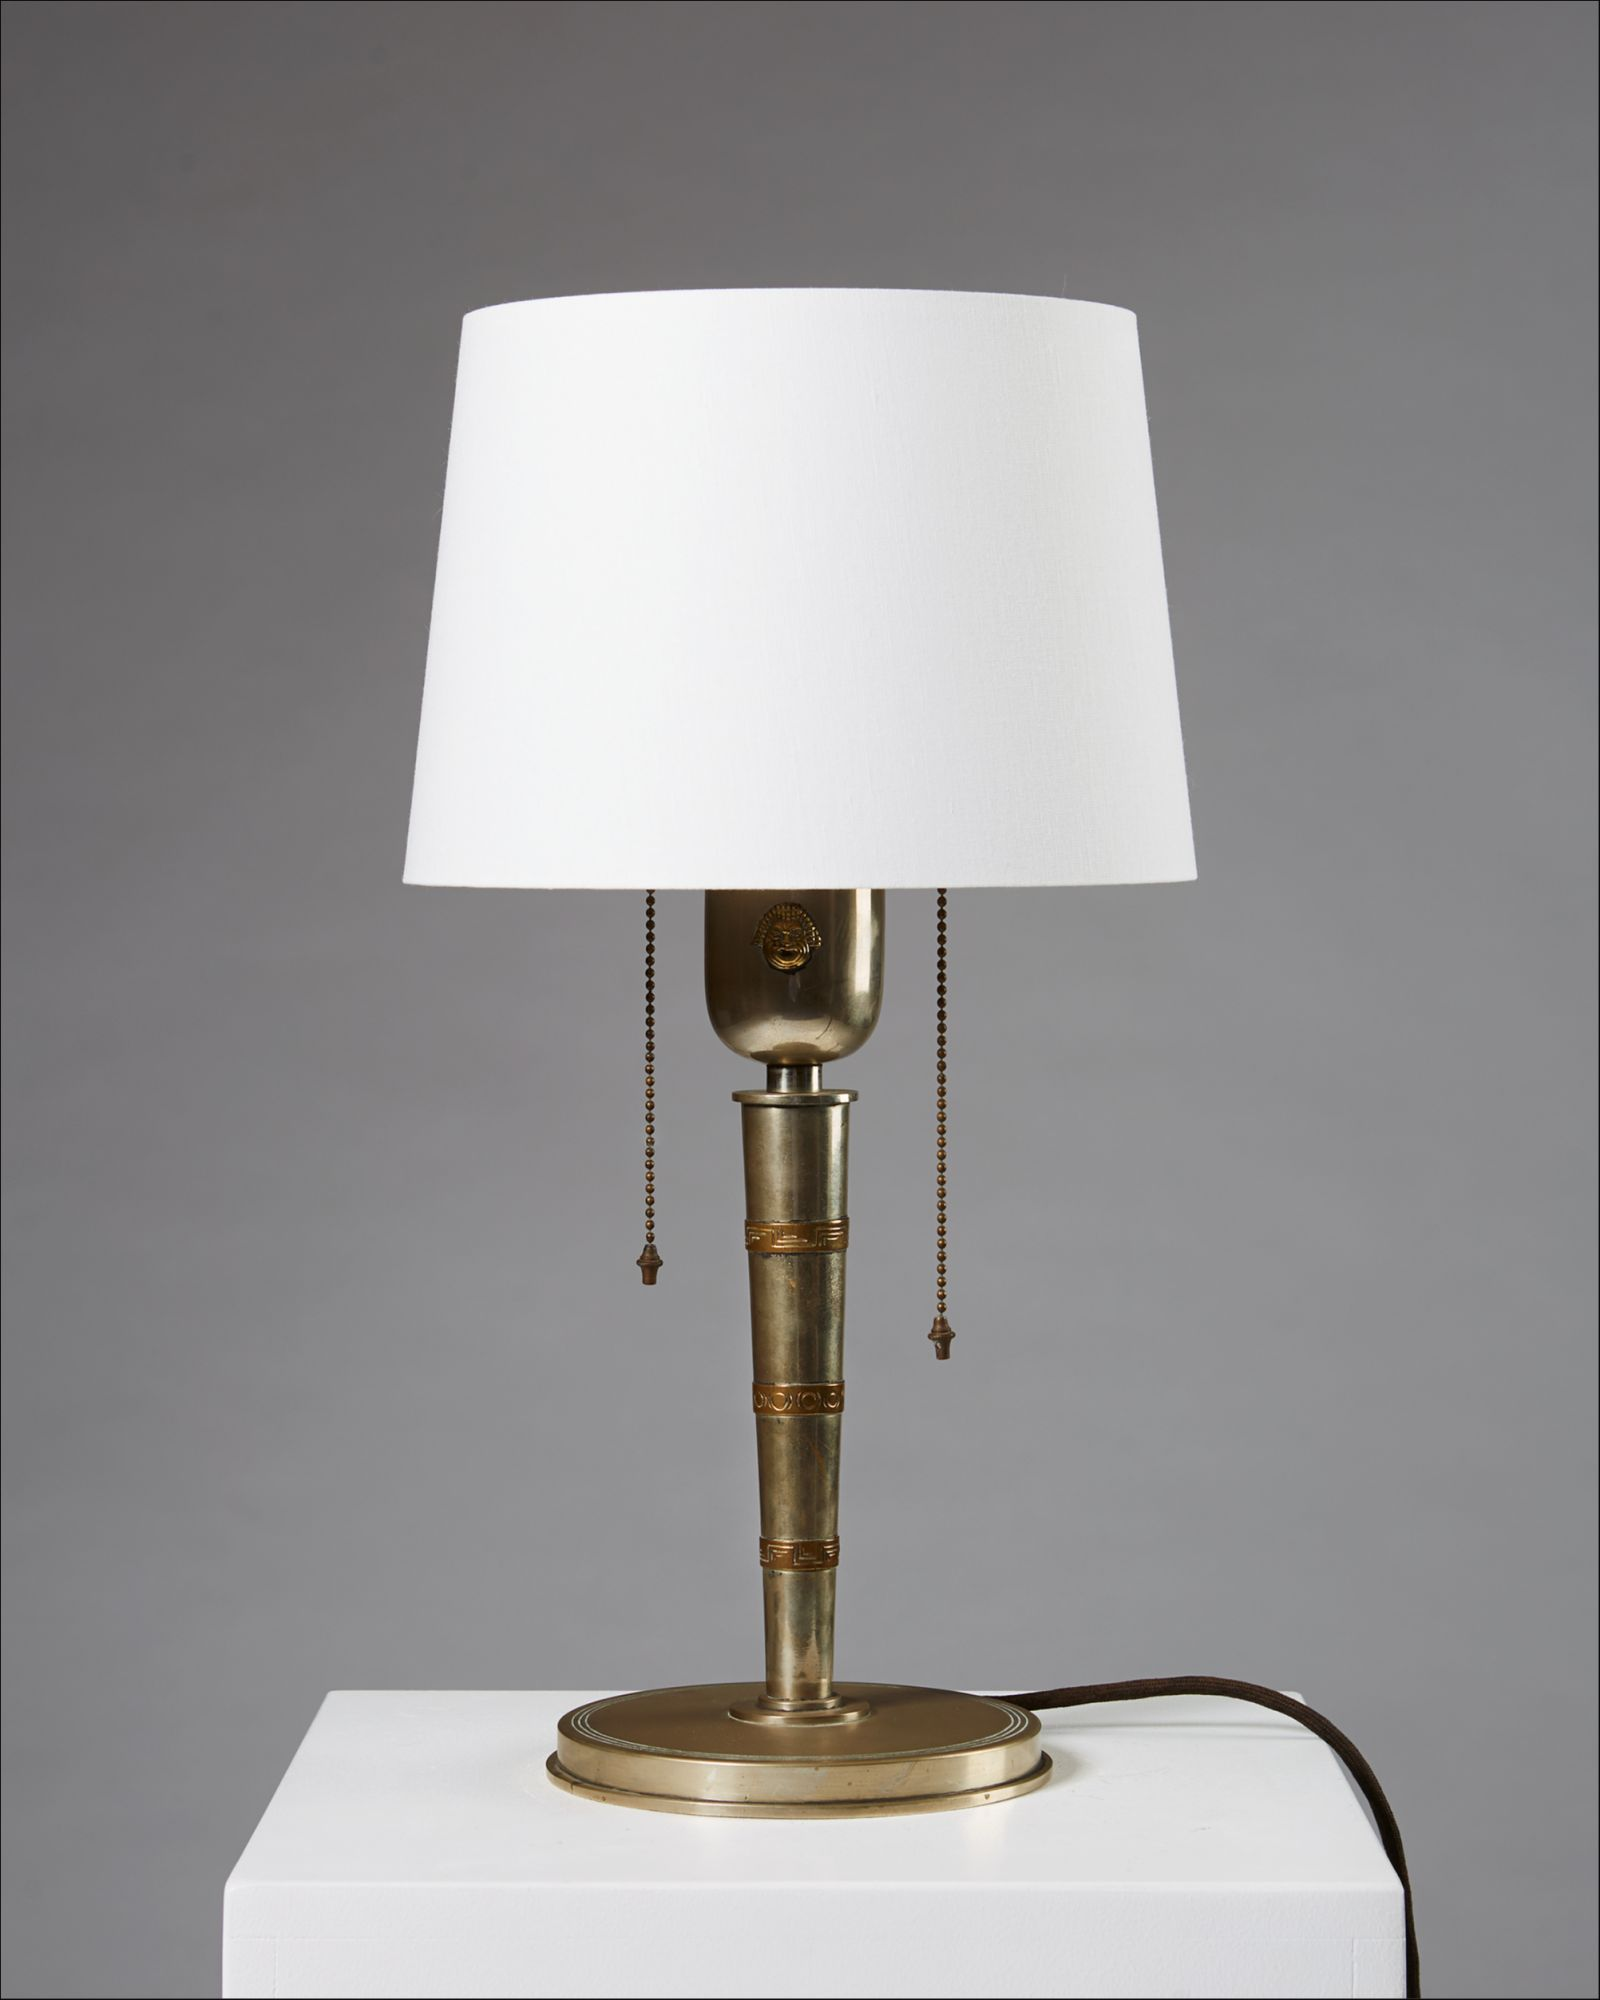 table lamp designed by tore kullander